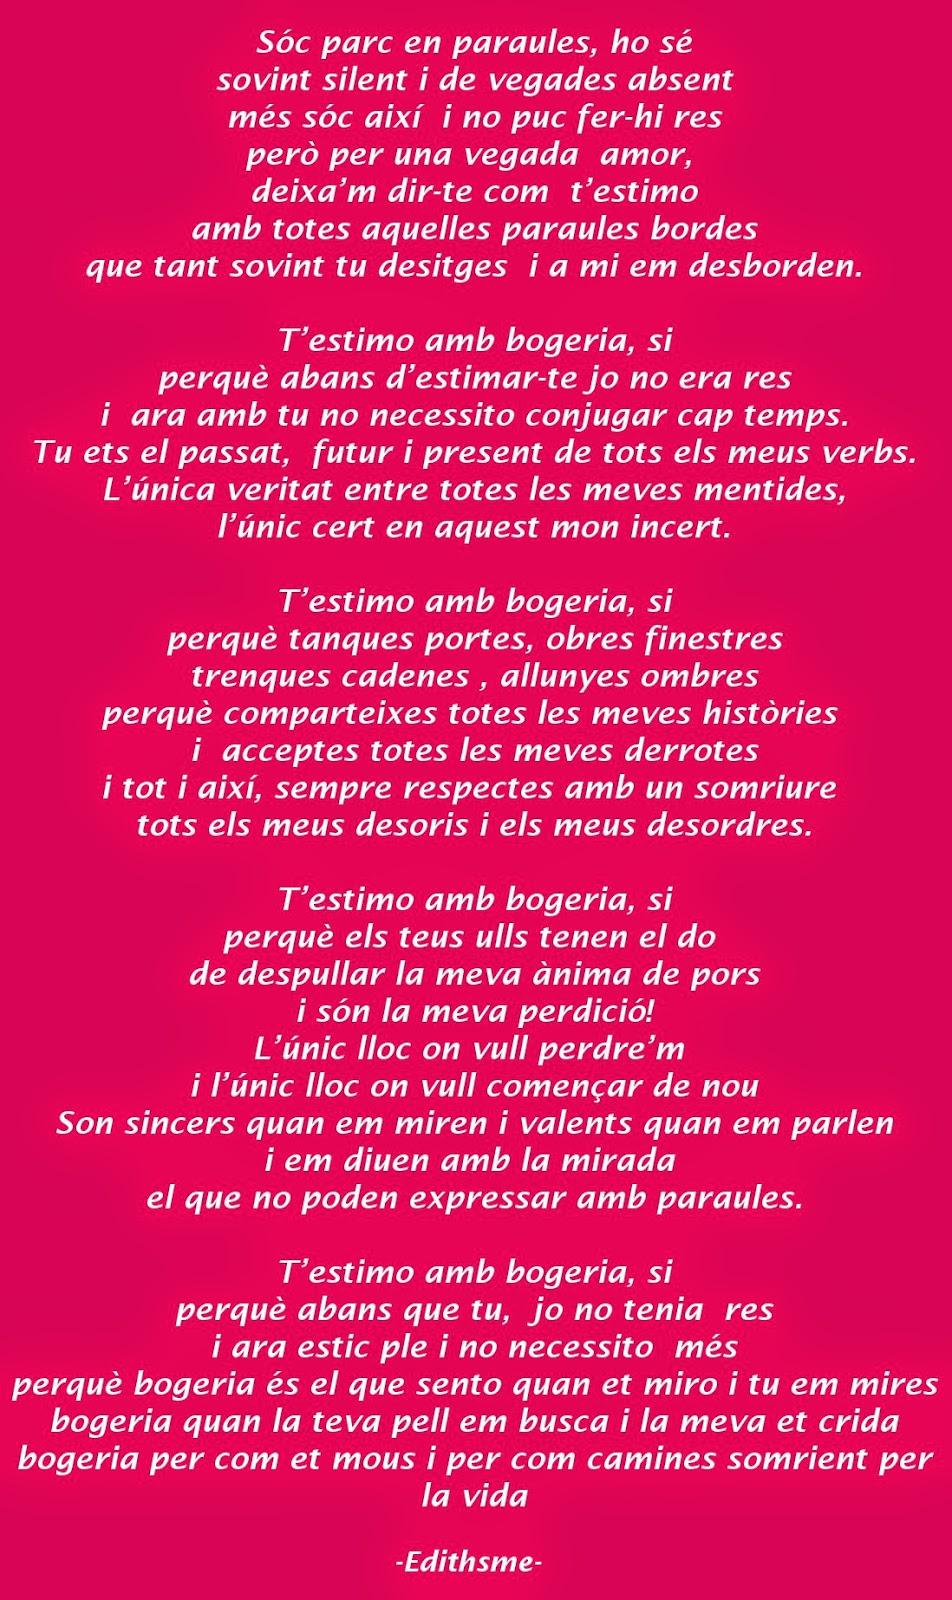 Edithsme 130 Frases D Amor I 4 Poemes Per Dir T Estimo